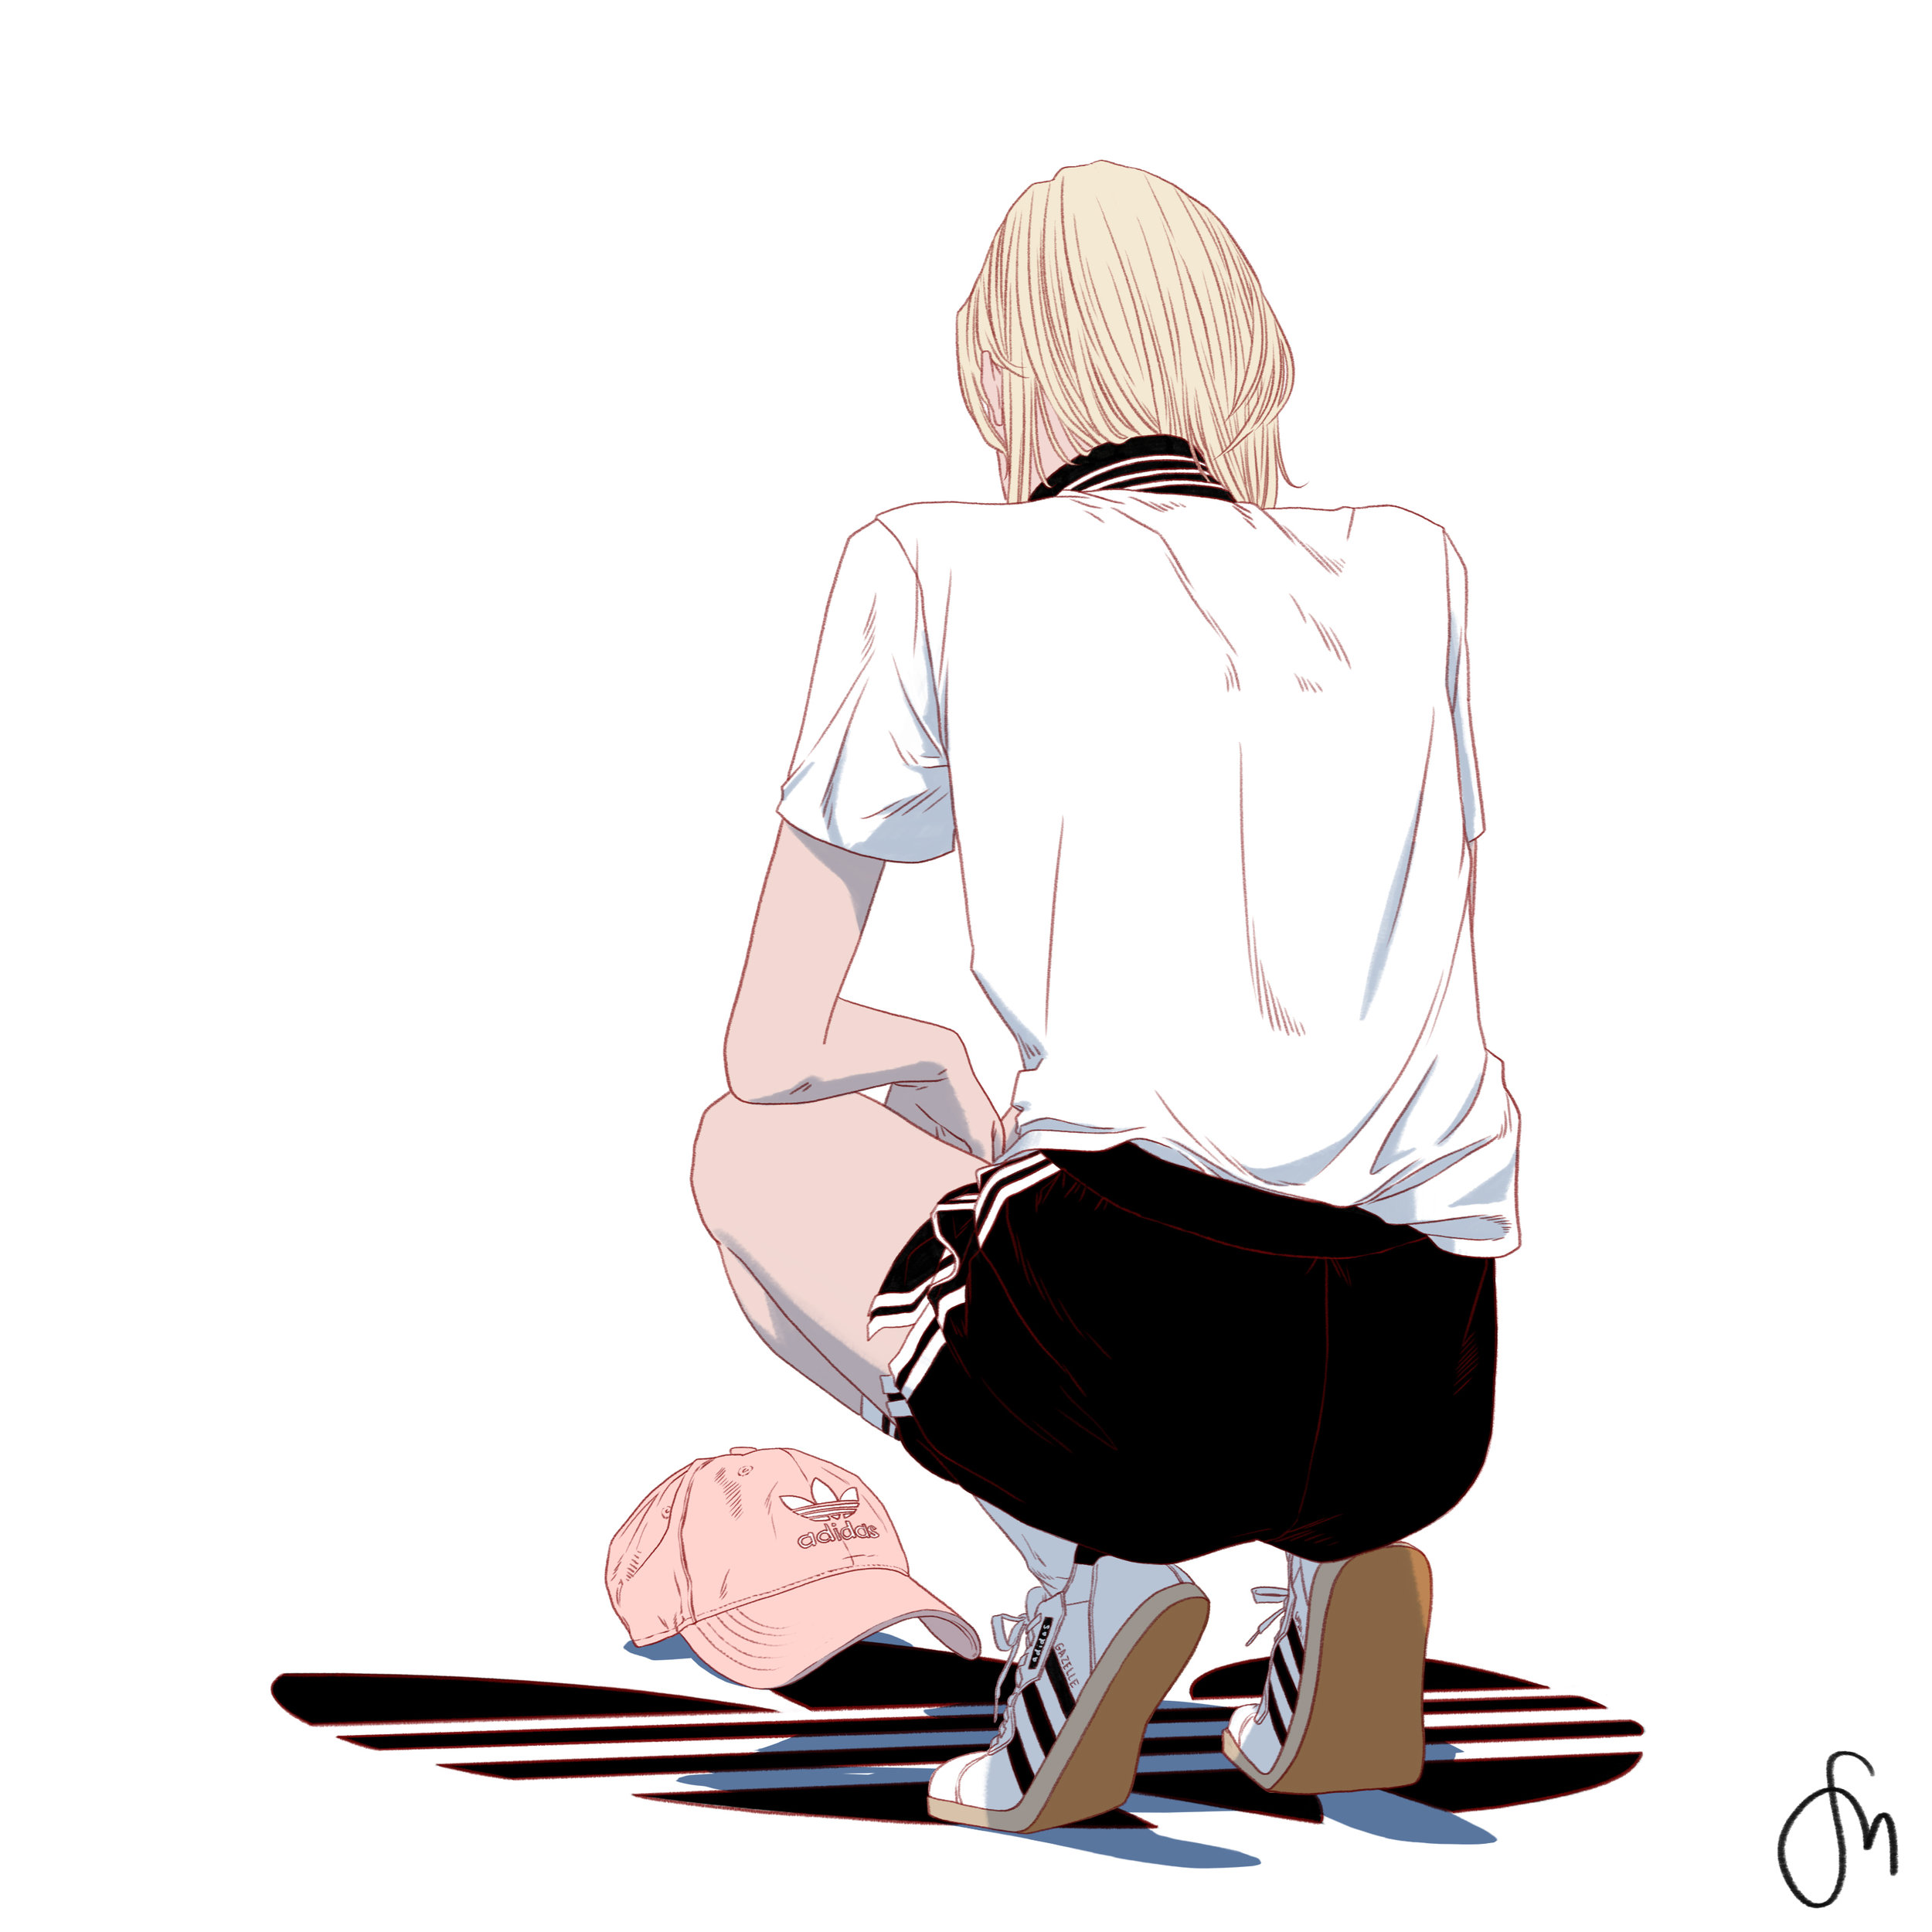 Adidas Toujours.jpg